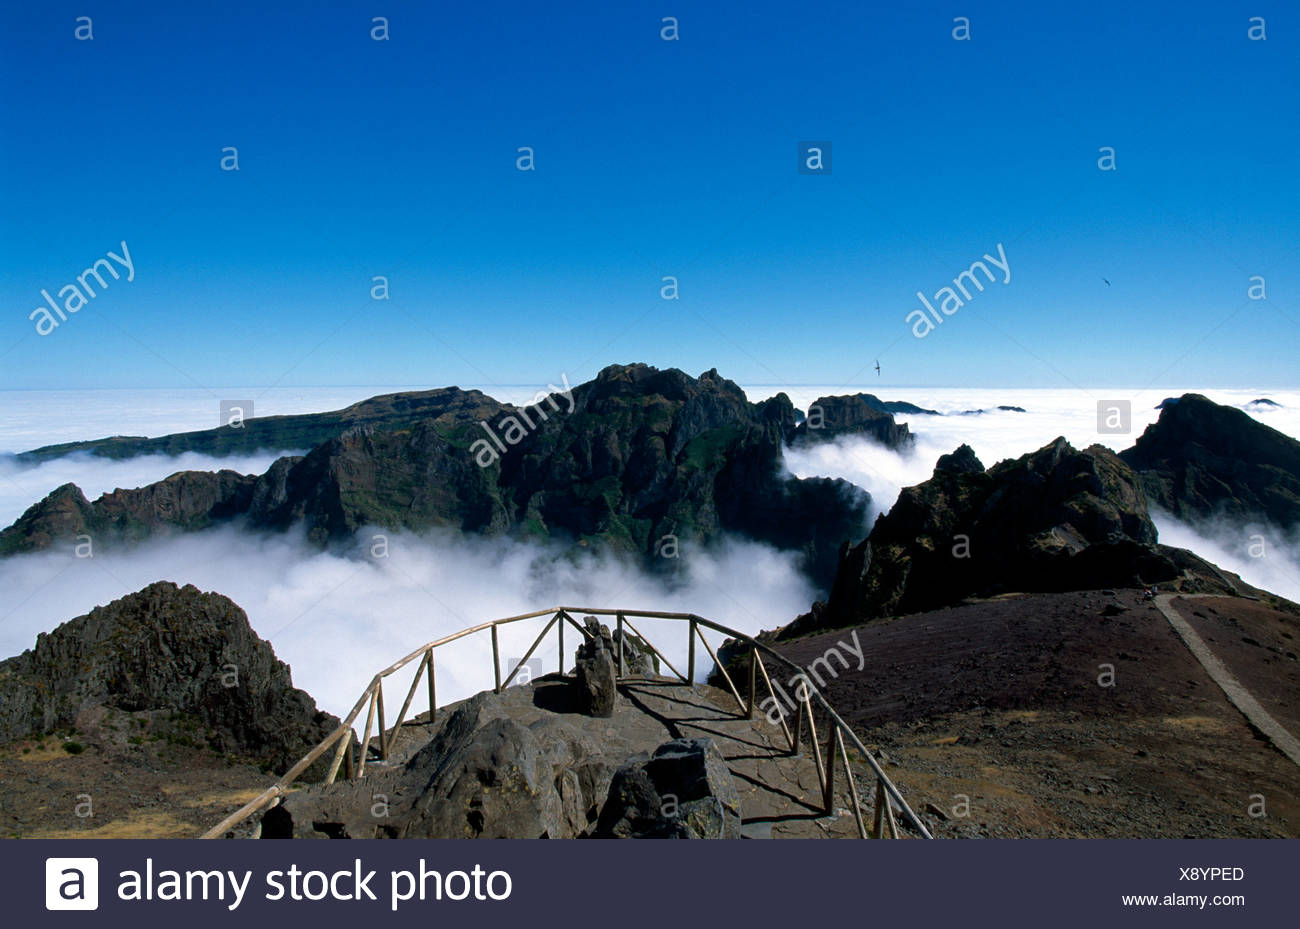 View of Mount Pico do Arieiro from Mount Miradouro do Juncal, Madeira, Portugal, Europe - Stock Image